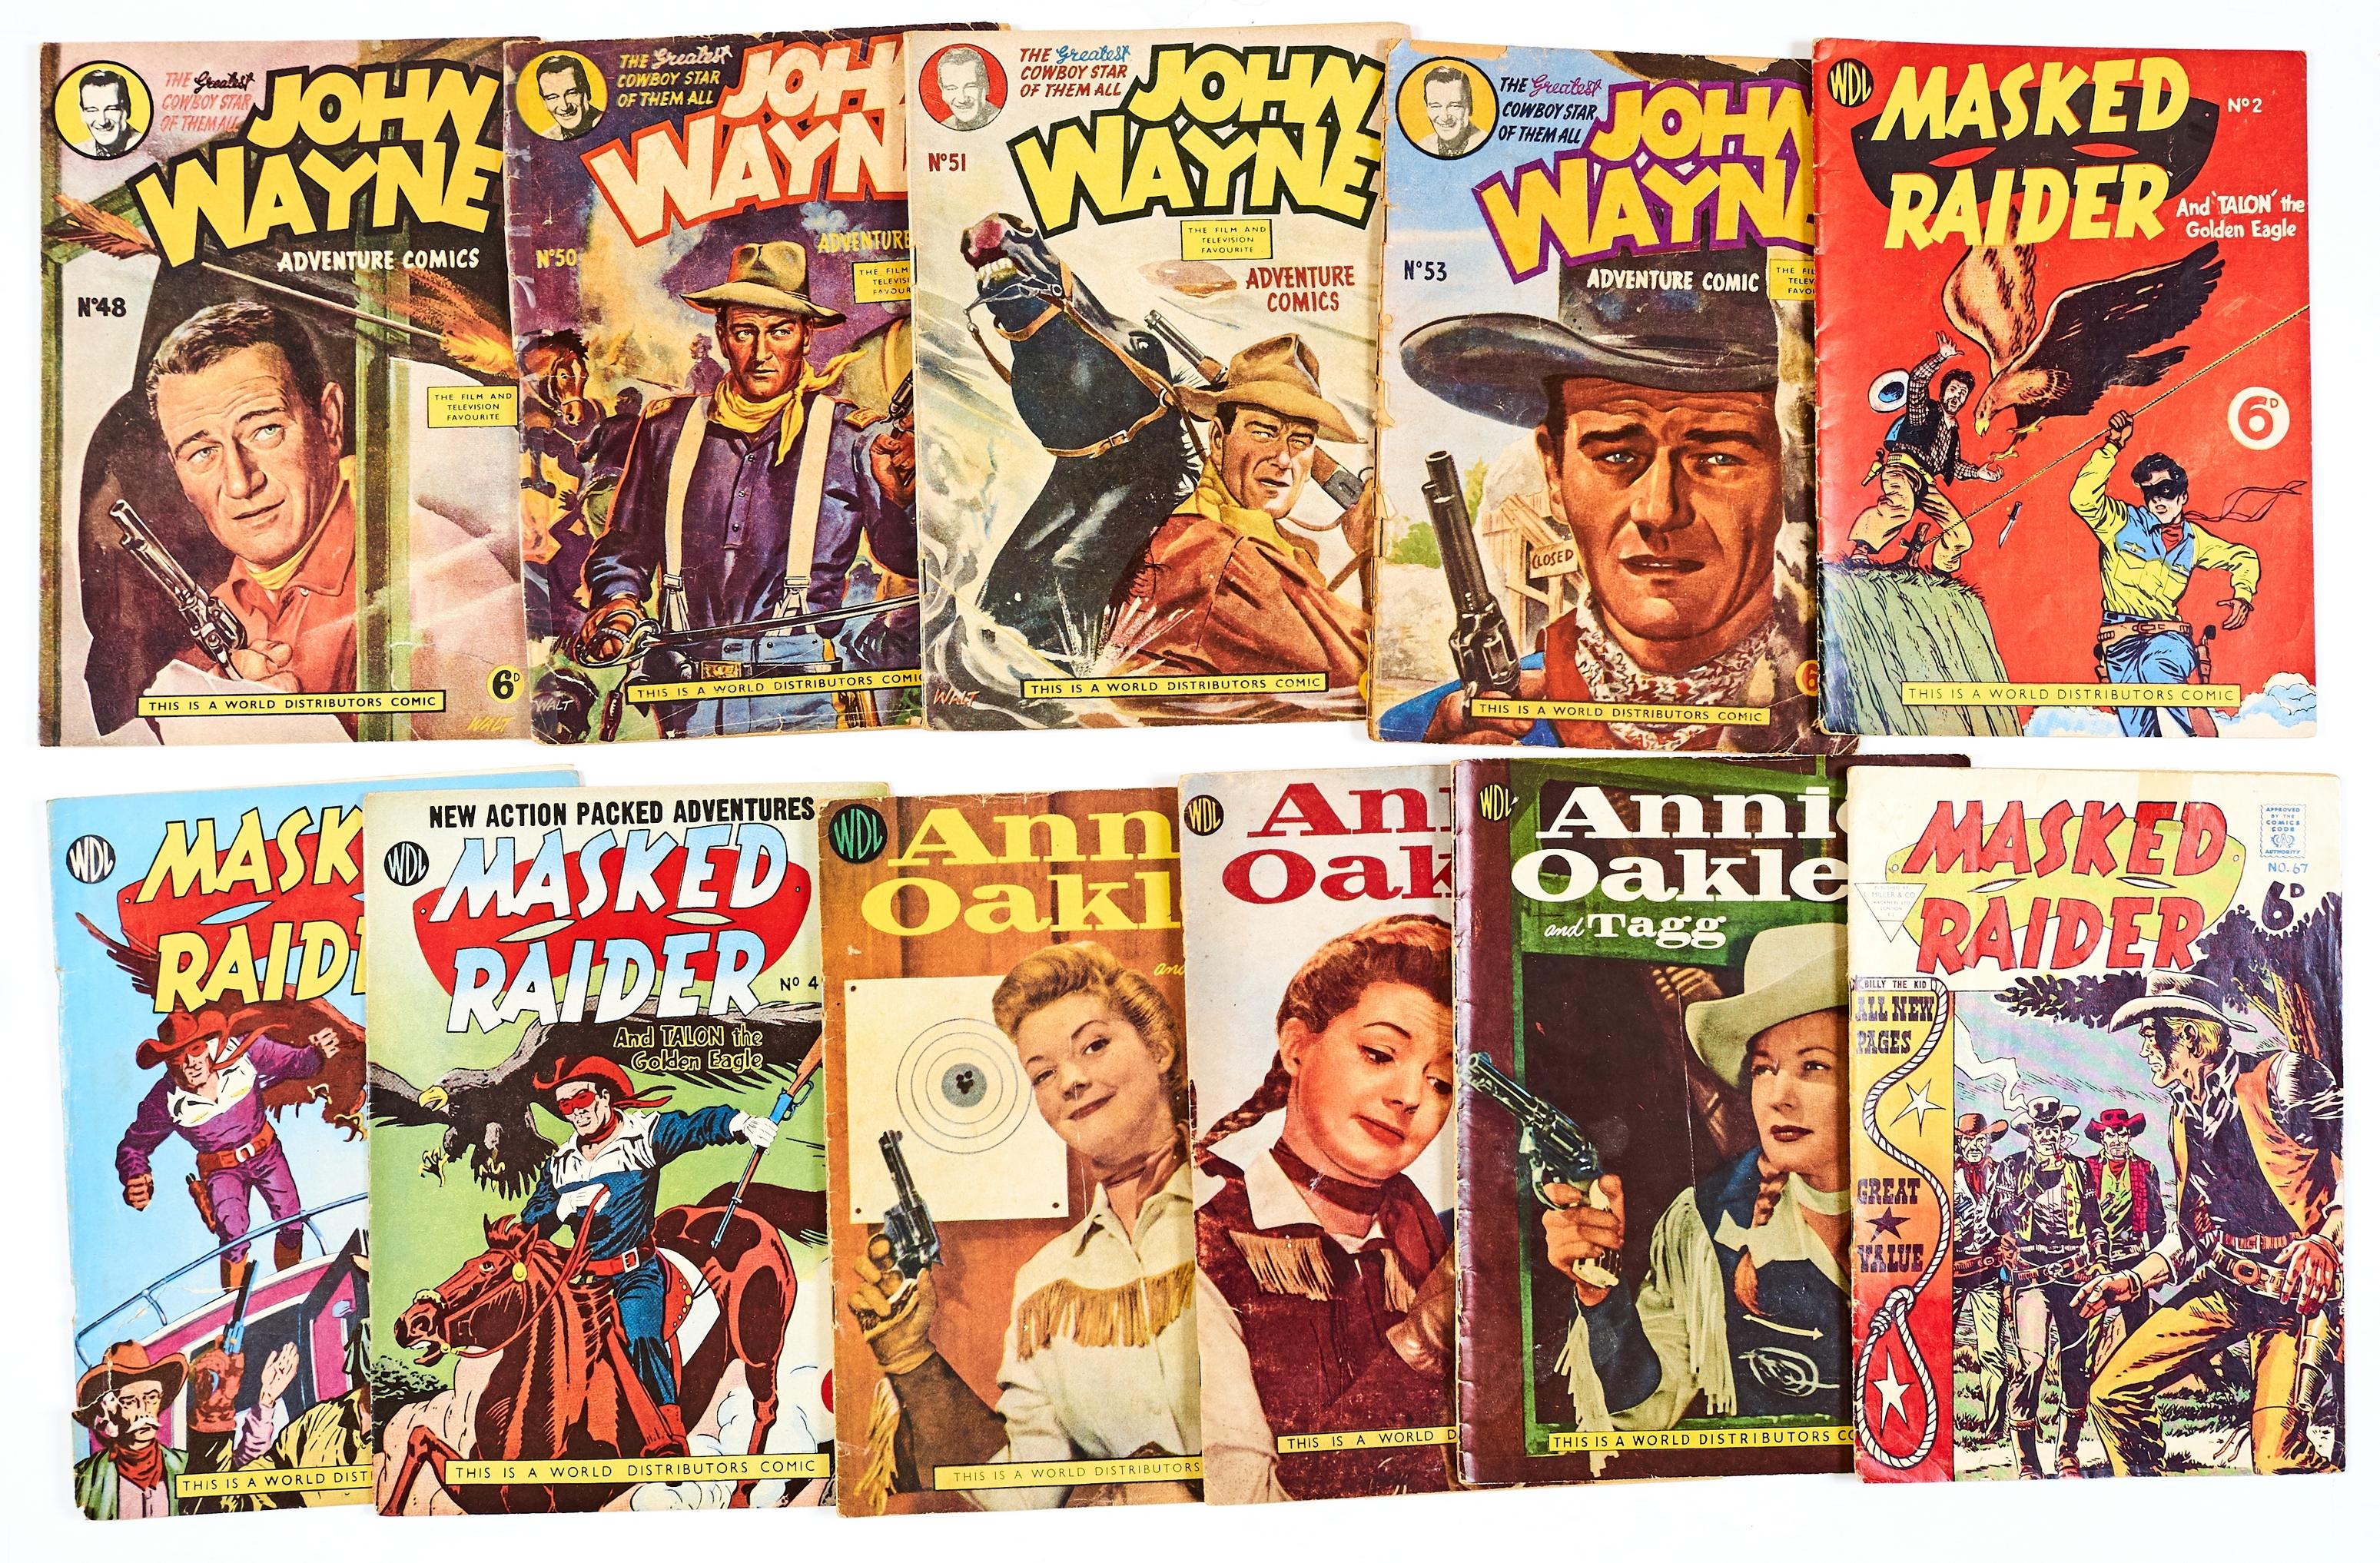 Lot 56 - John Wayne Adventure Comics (1950s WDL) 48, 50, 51, 53. With Masked Raider 2, 3, 4, 67 and Annie